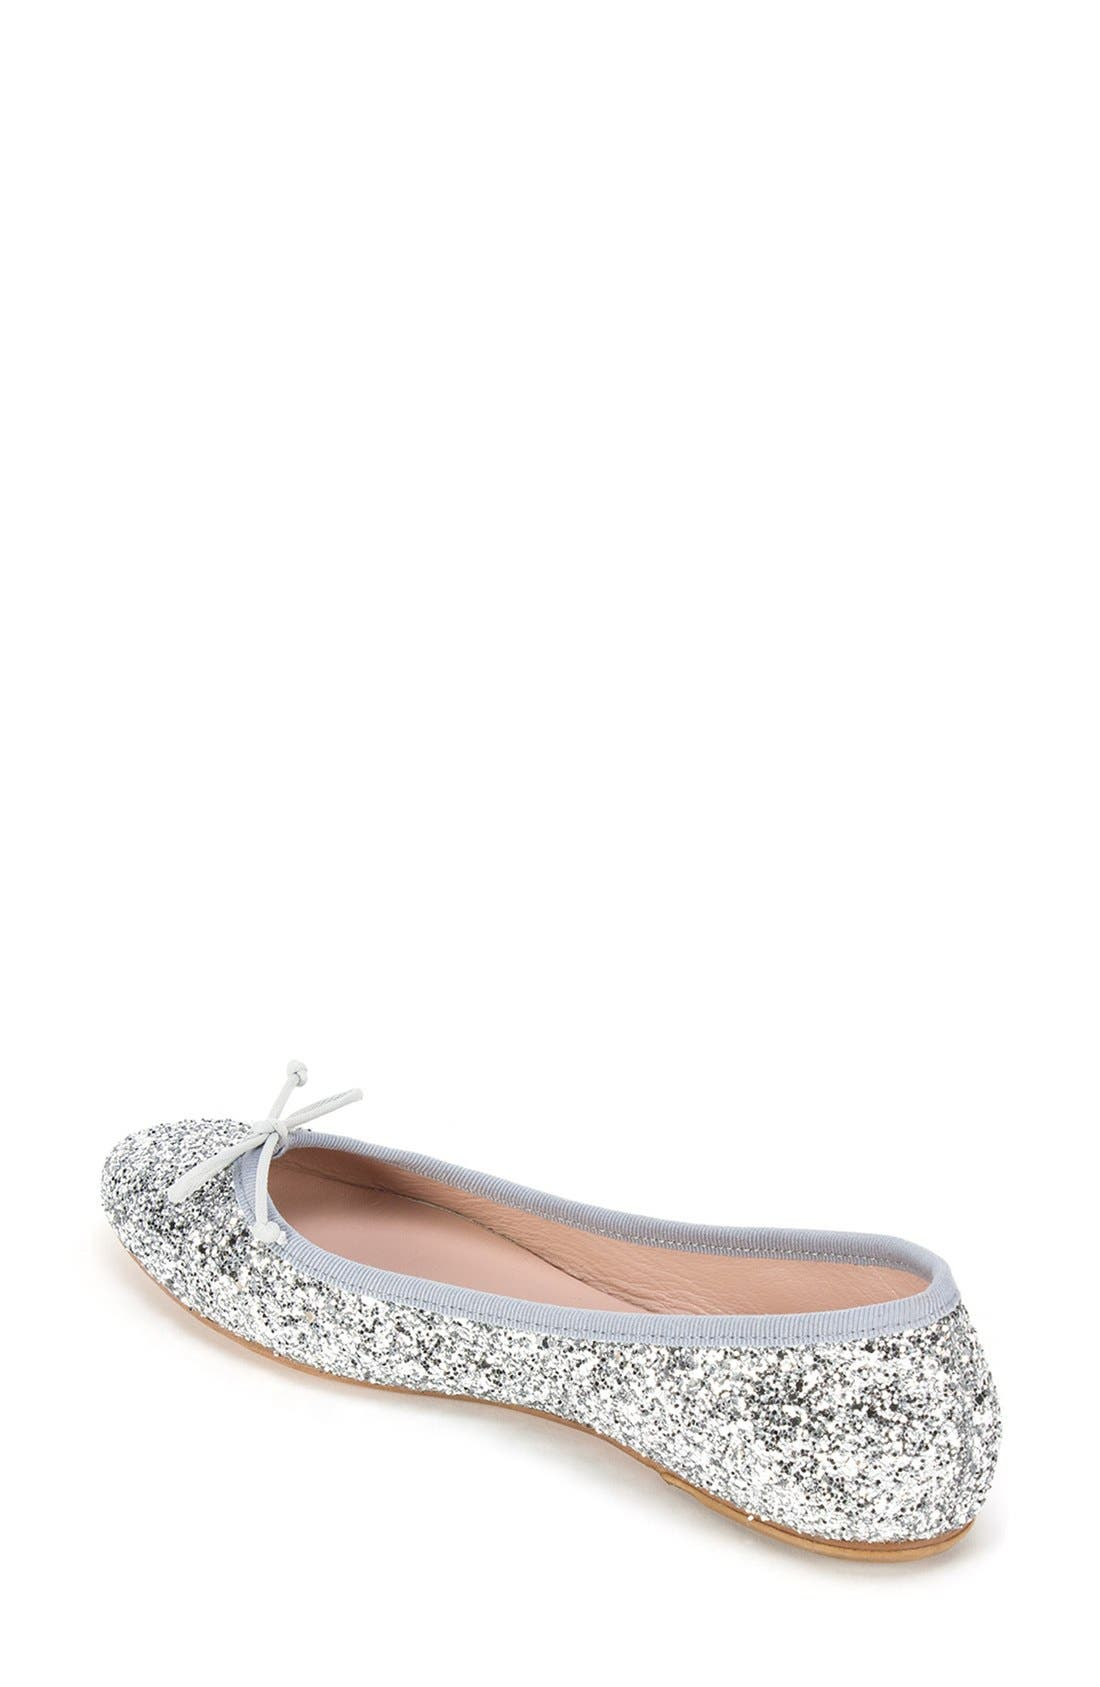 Summit 'Kendall' Ballet Flat,                             Alternate thumbnail 21, color,